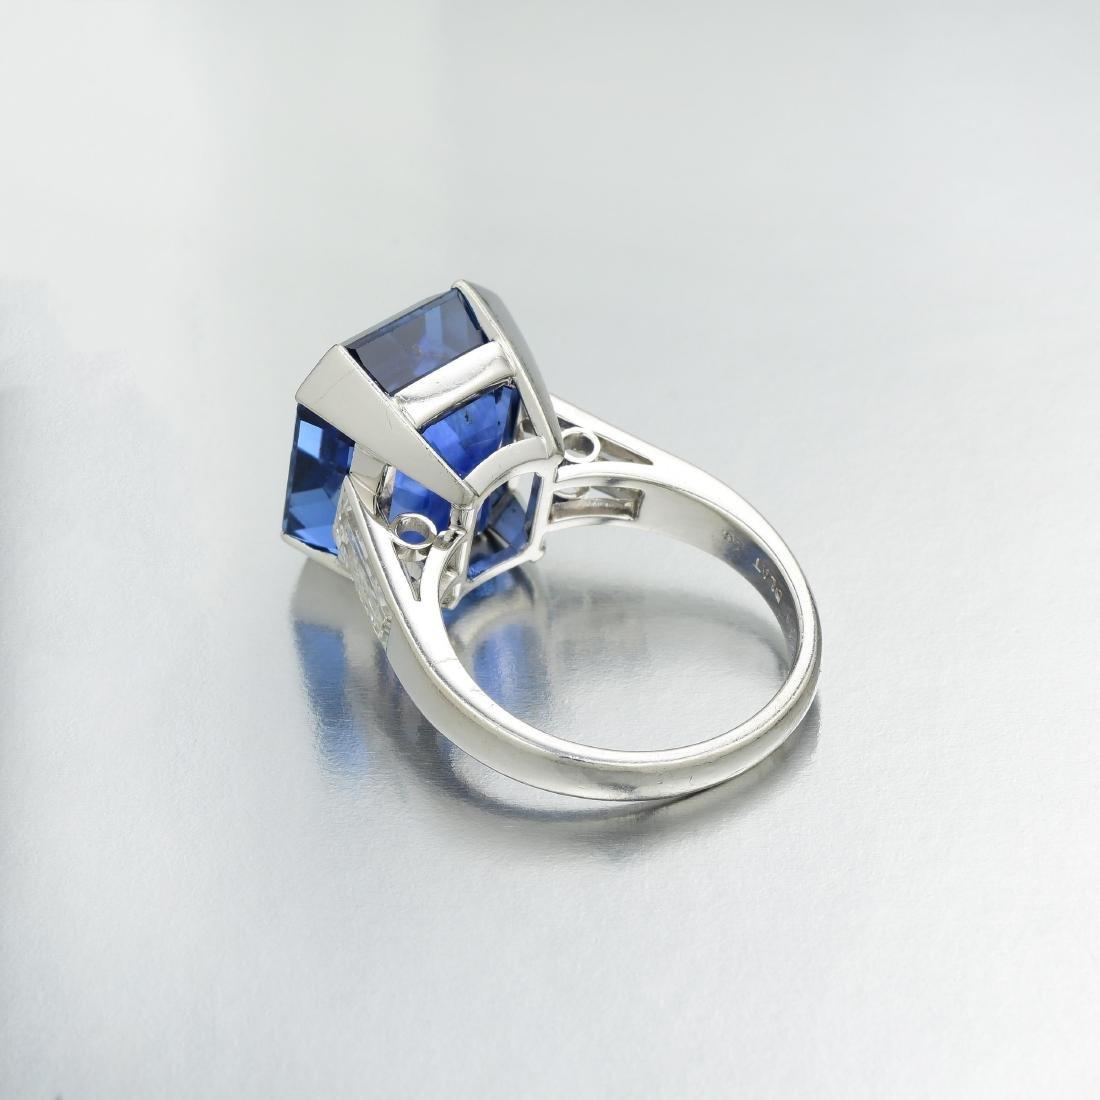 Art Deco 21.61-Carat Unheated Ceylon Sapphire and - 4